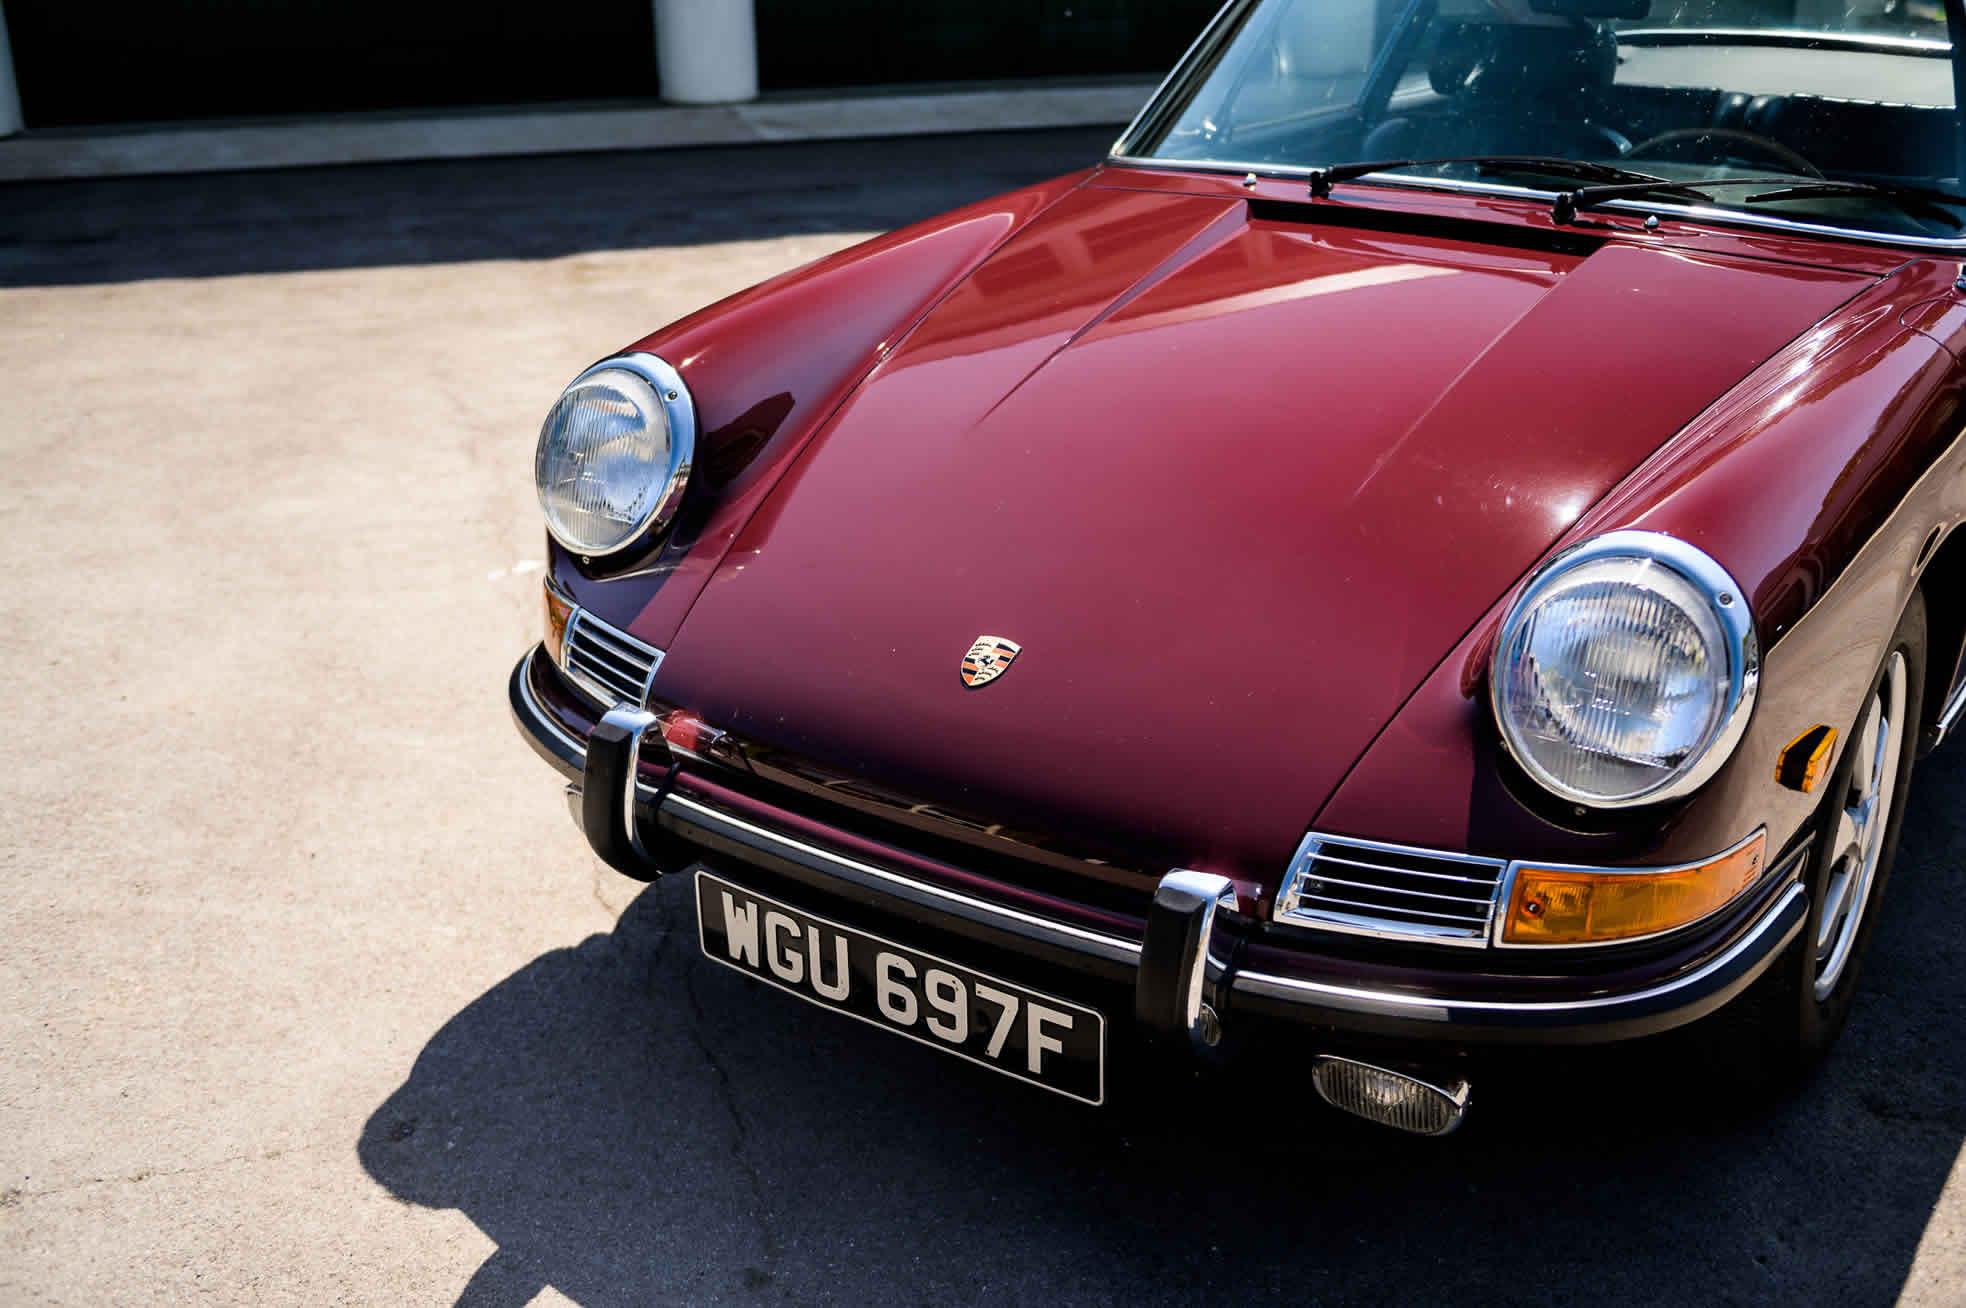 For Sale 1968 Porsche 911 L Sports Purpose Bicester Heritage